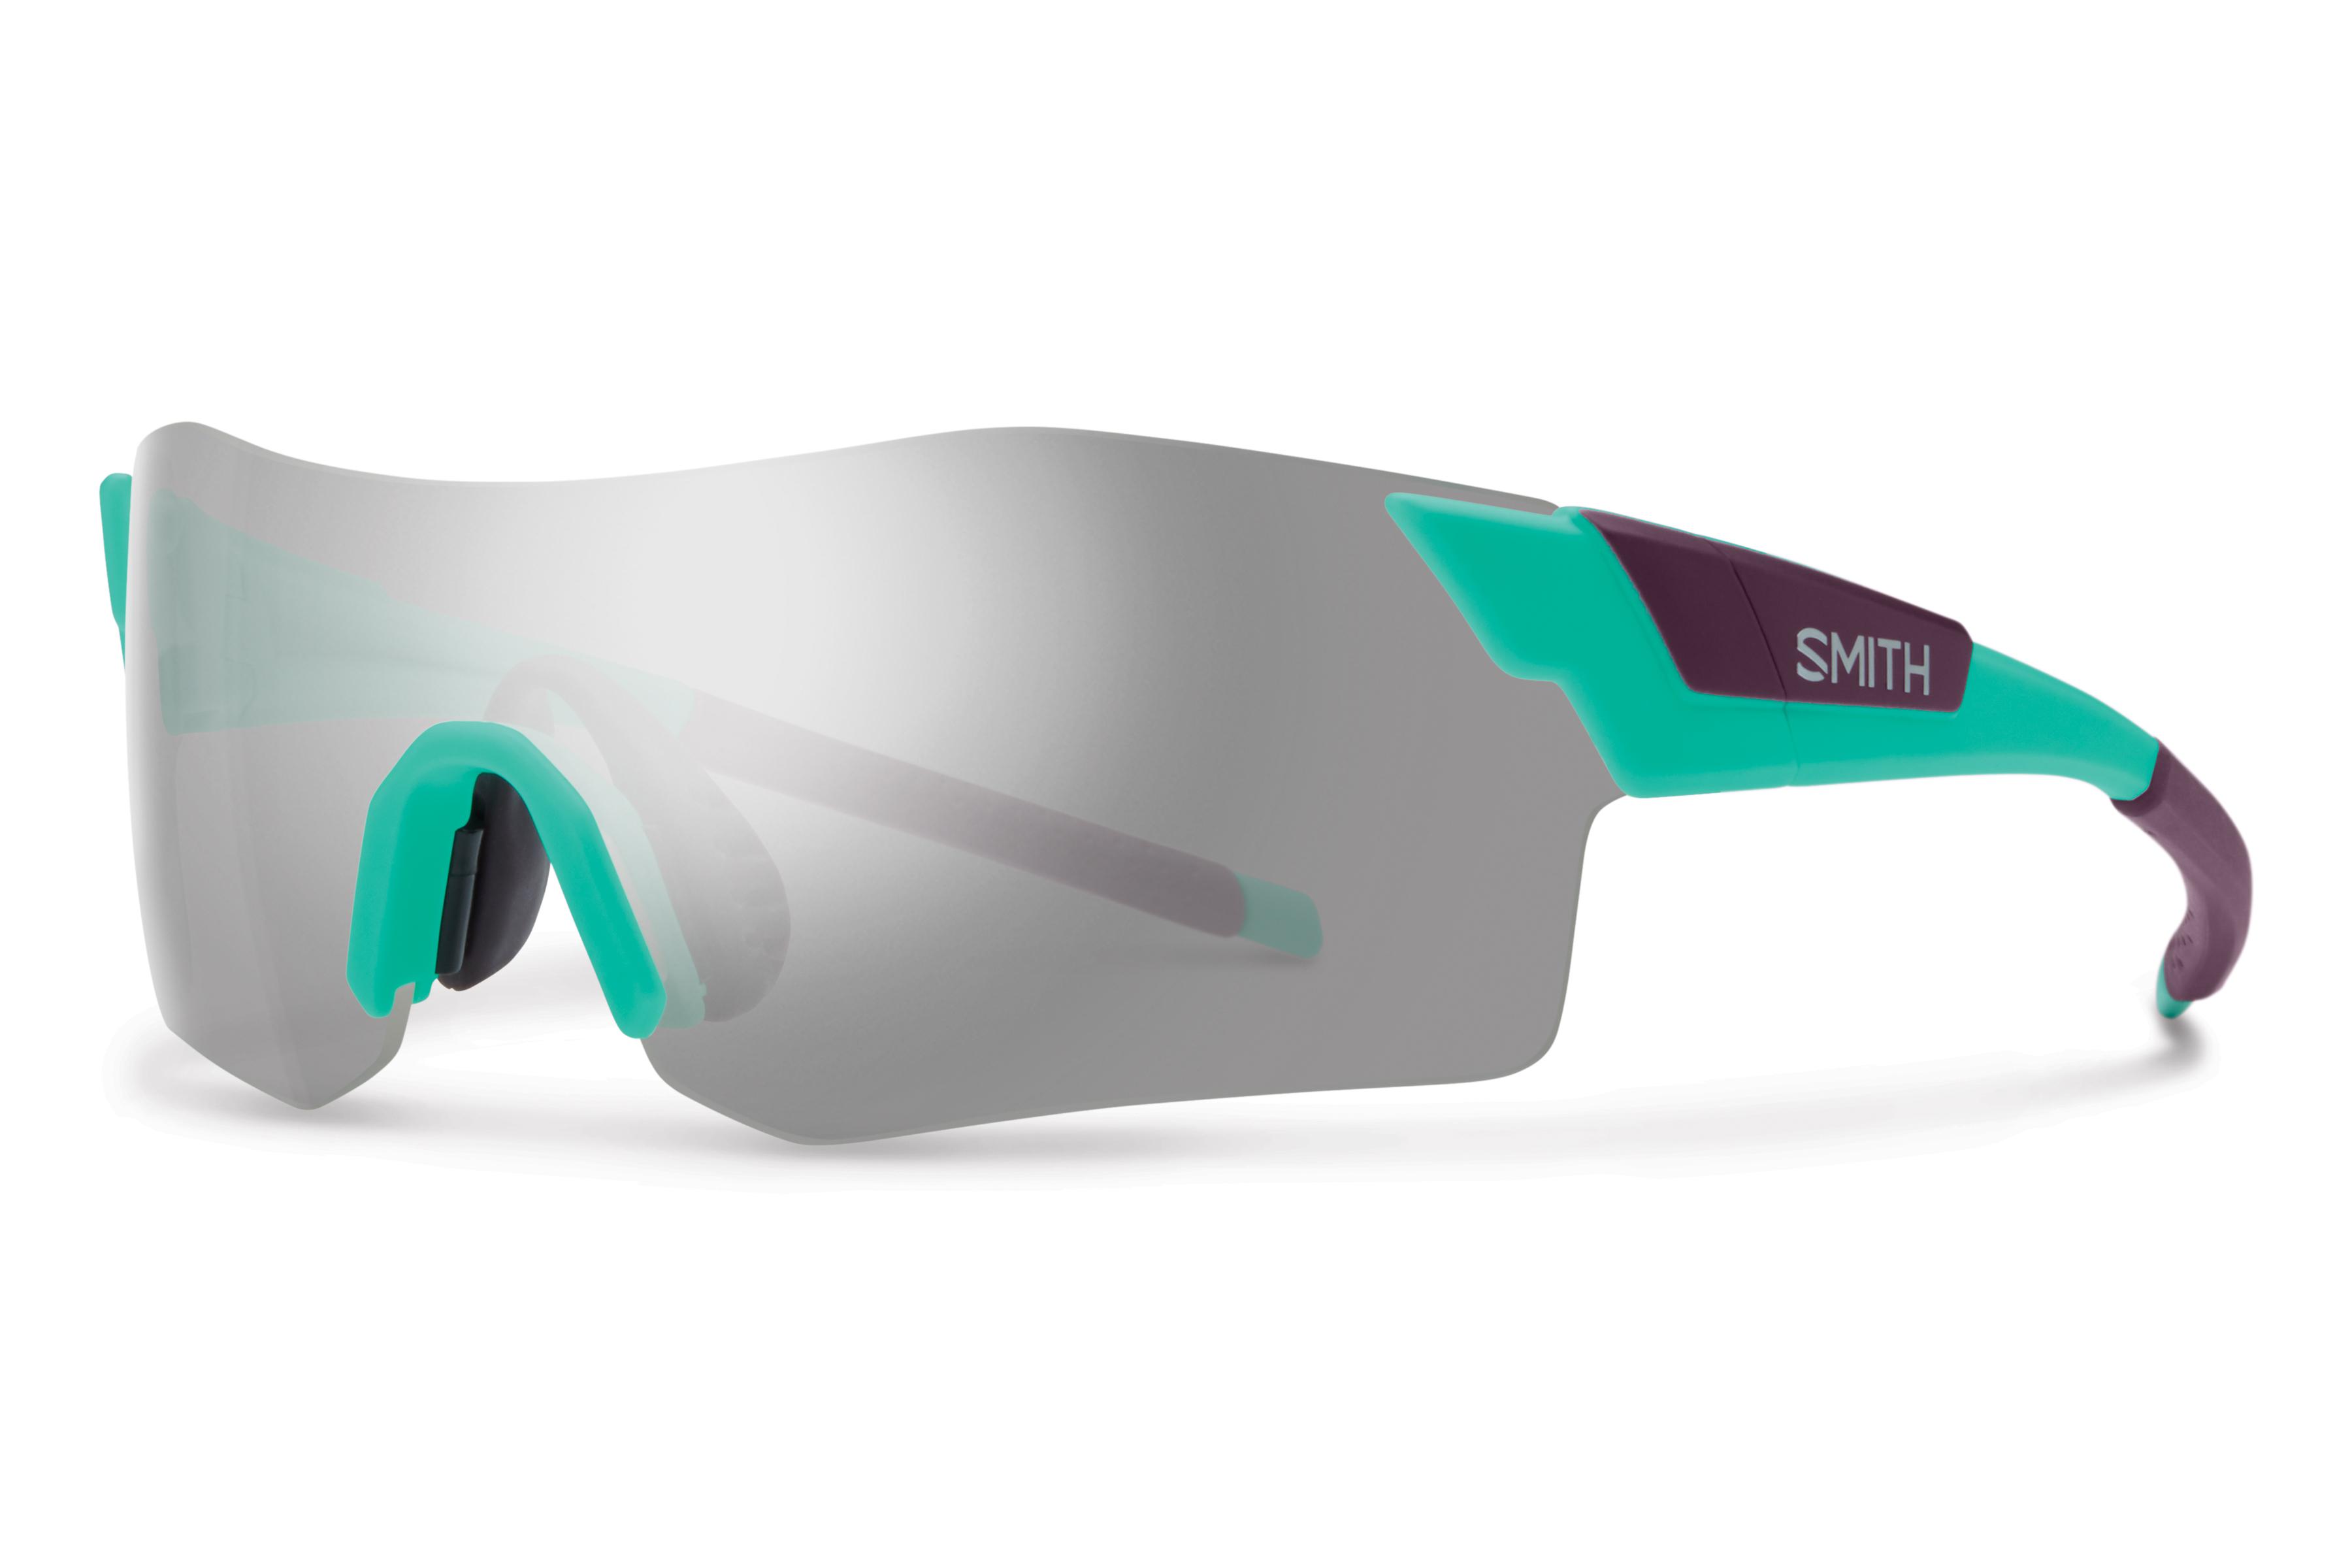 fd924565bb Cycling sunglasses